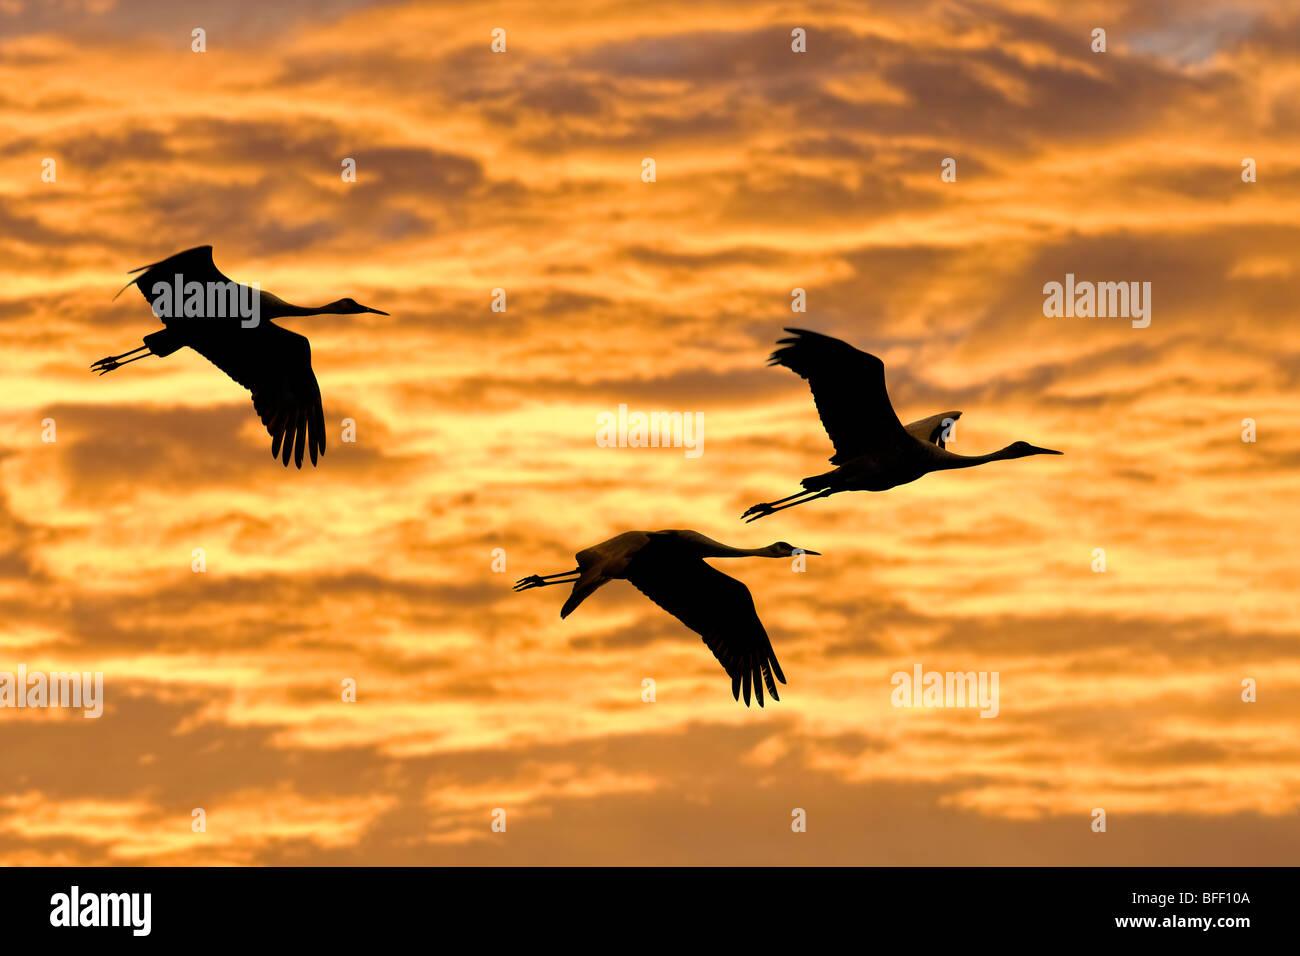 Sandhill cranes (Grus americana), central Florida, U.S.A. - Stock Image